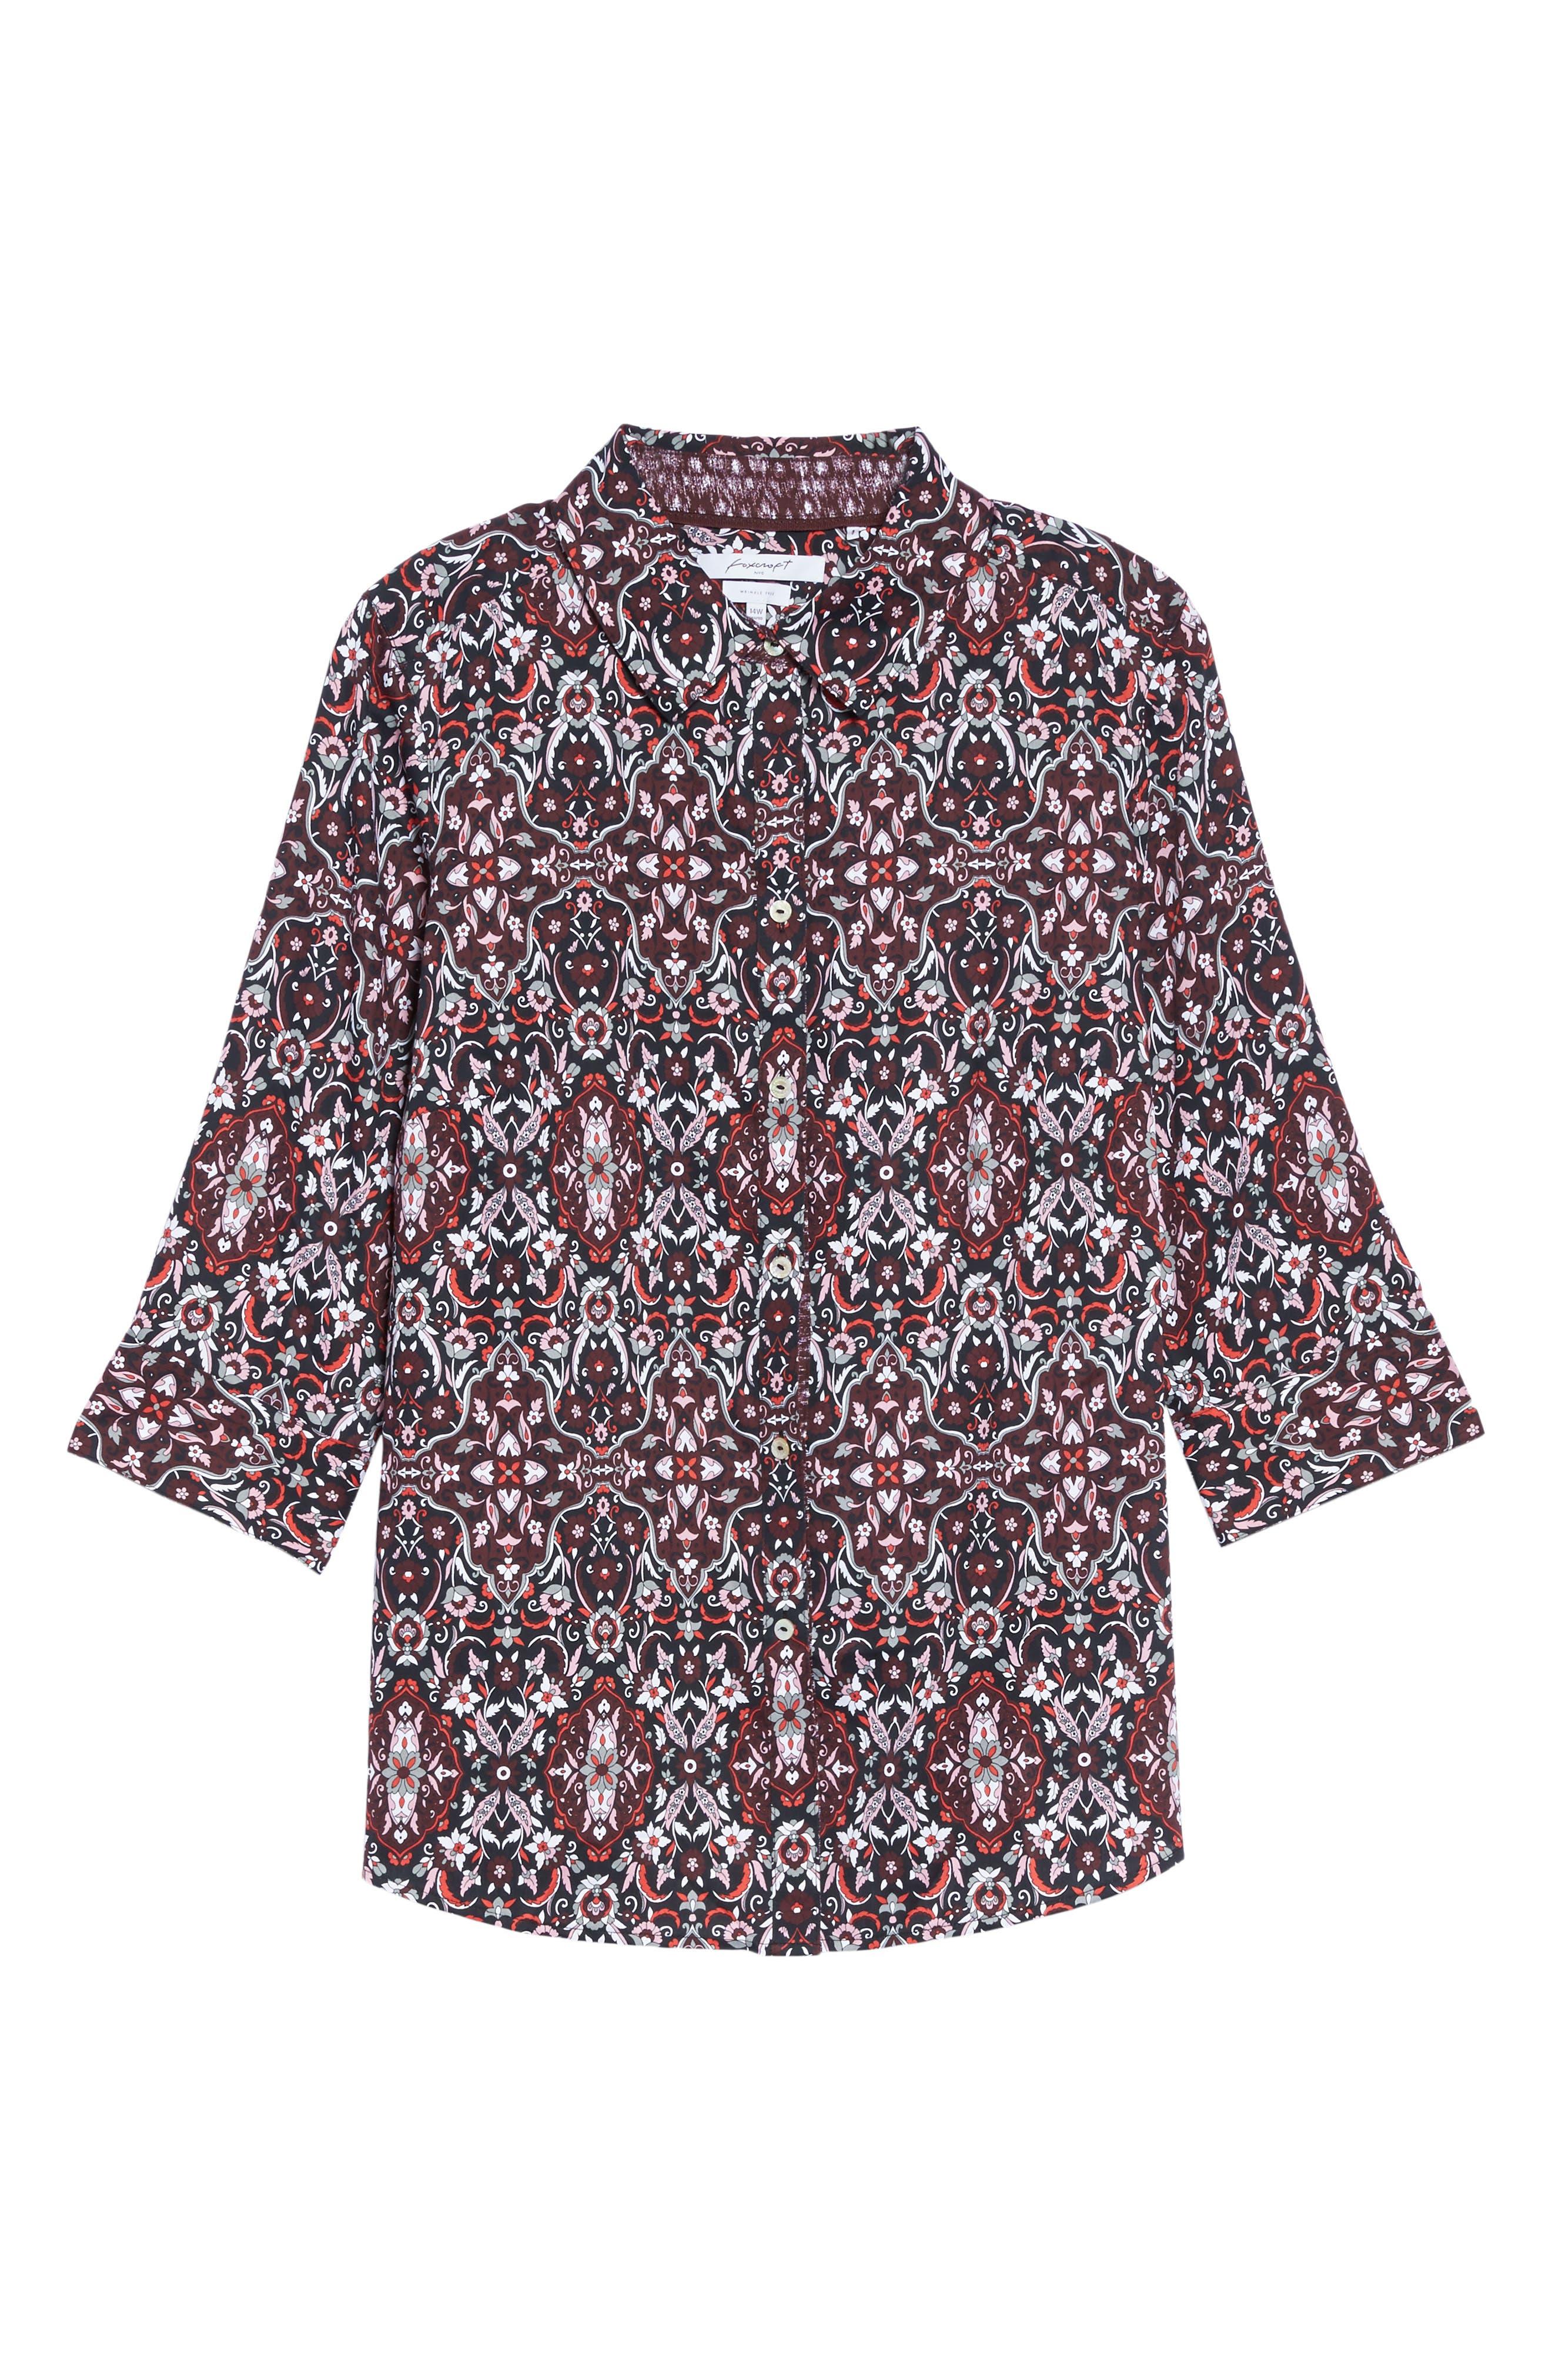 Ava Heirloom Paisley Print Cotton Shirt,                             Alternate thumbnail 6, color,                             Multi